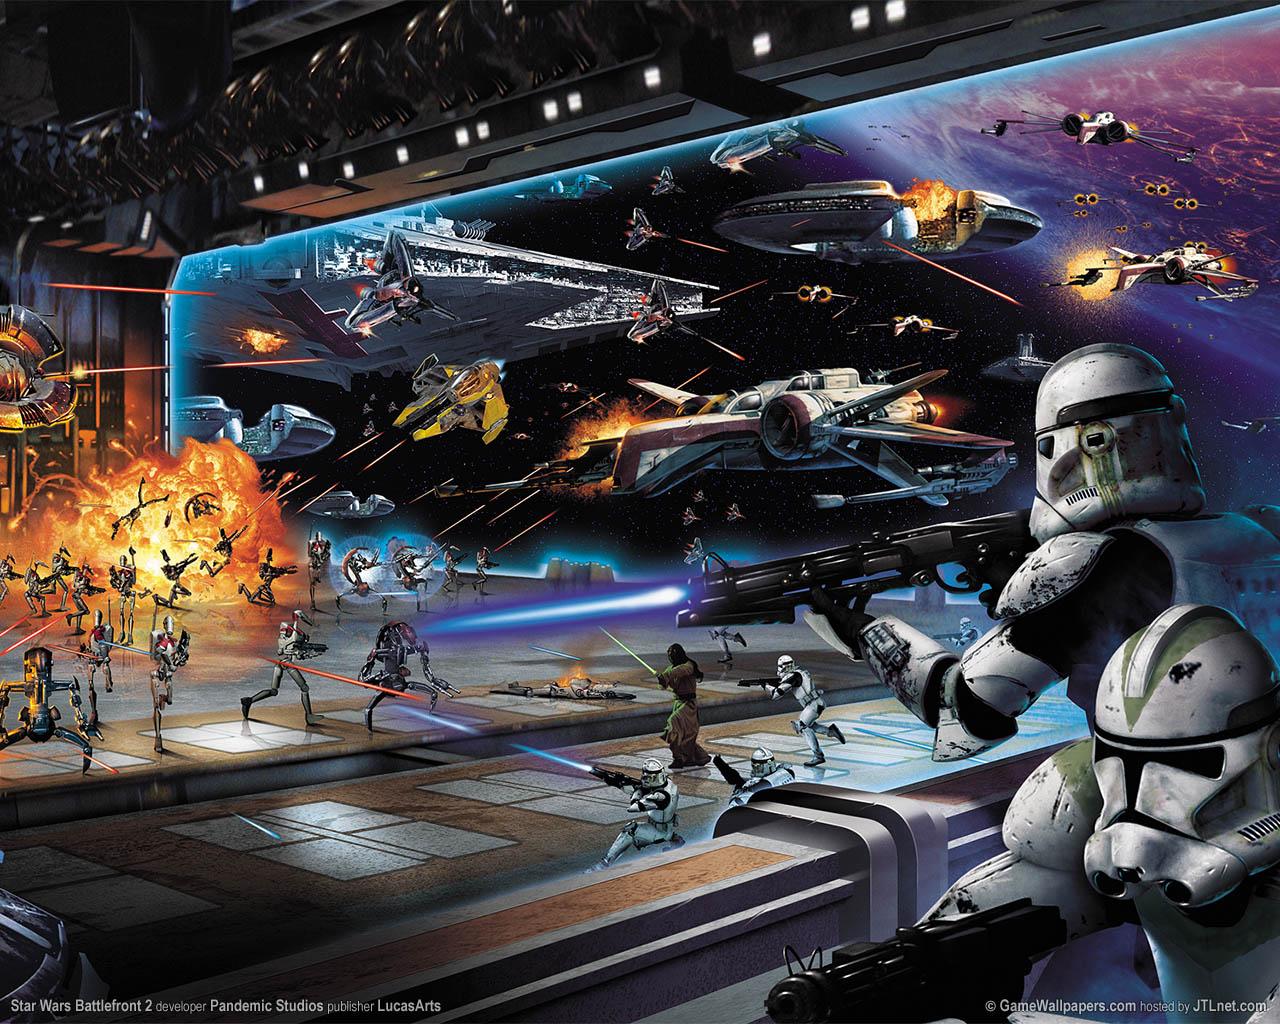 http://3.bp.blogspot.com/-rq-D82XaFFM/TwptlaXIj6I/AAAAAAAAAEc/T4WtGV-mDyw/s1600/star-wars-battle-wallpaper.jpg